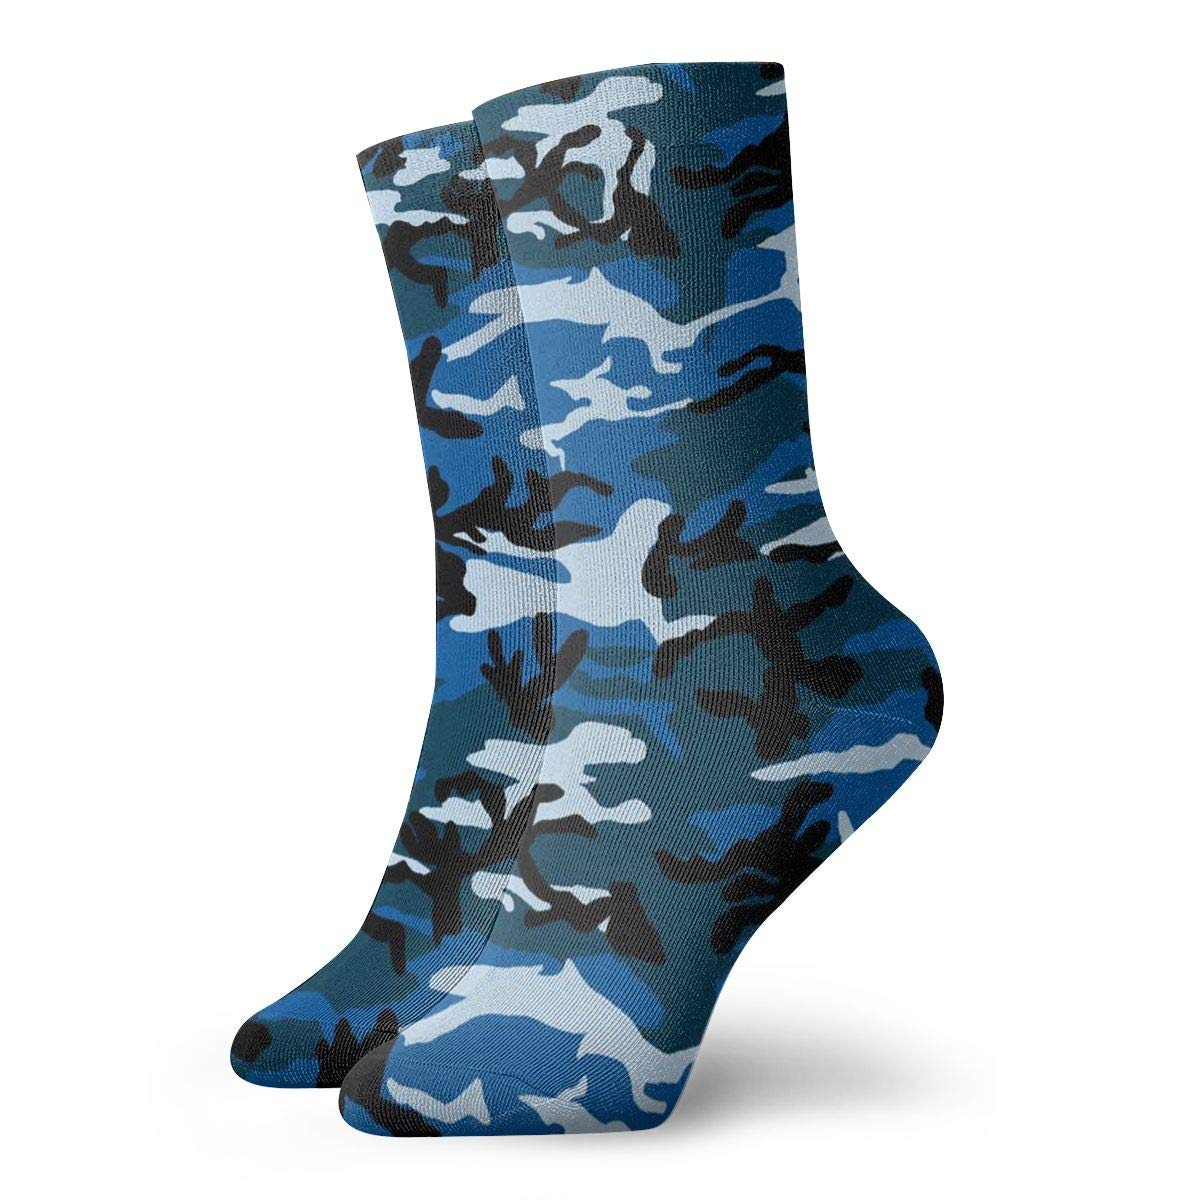 SESY Navy Camouflage Unisex Crew Socks Short Sports Stocking